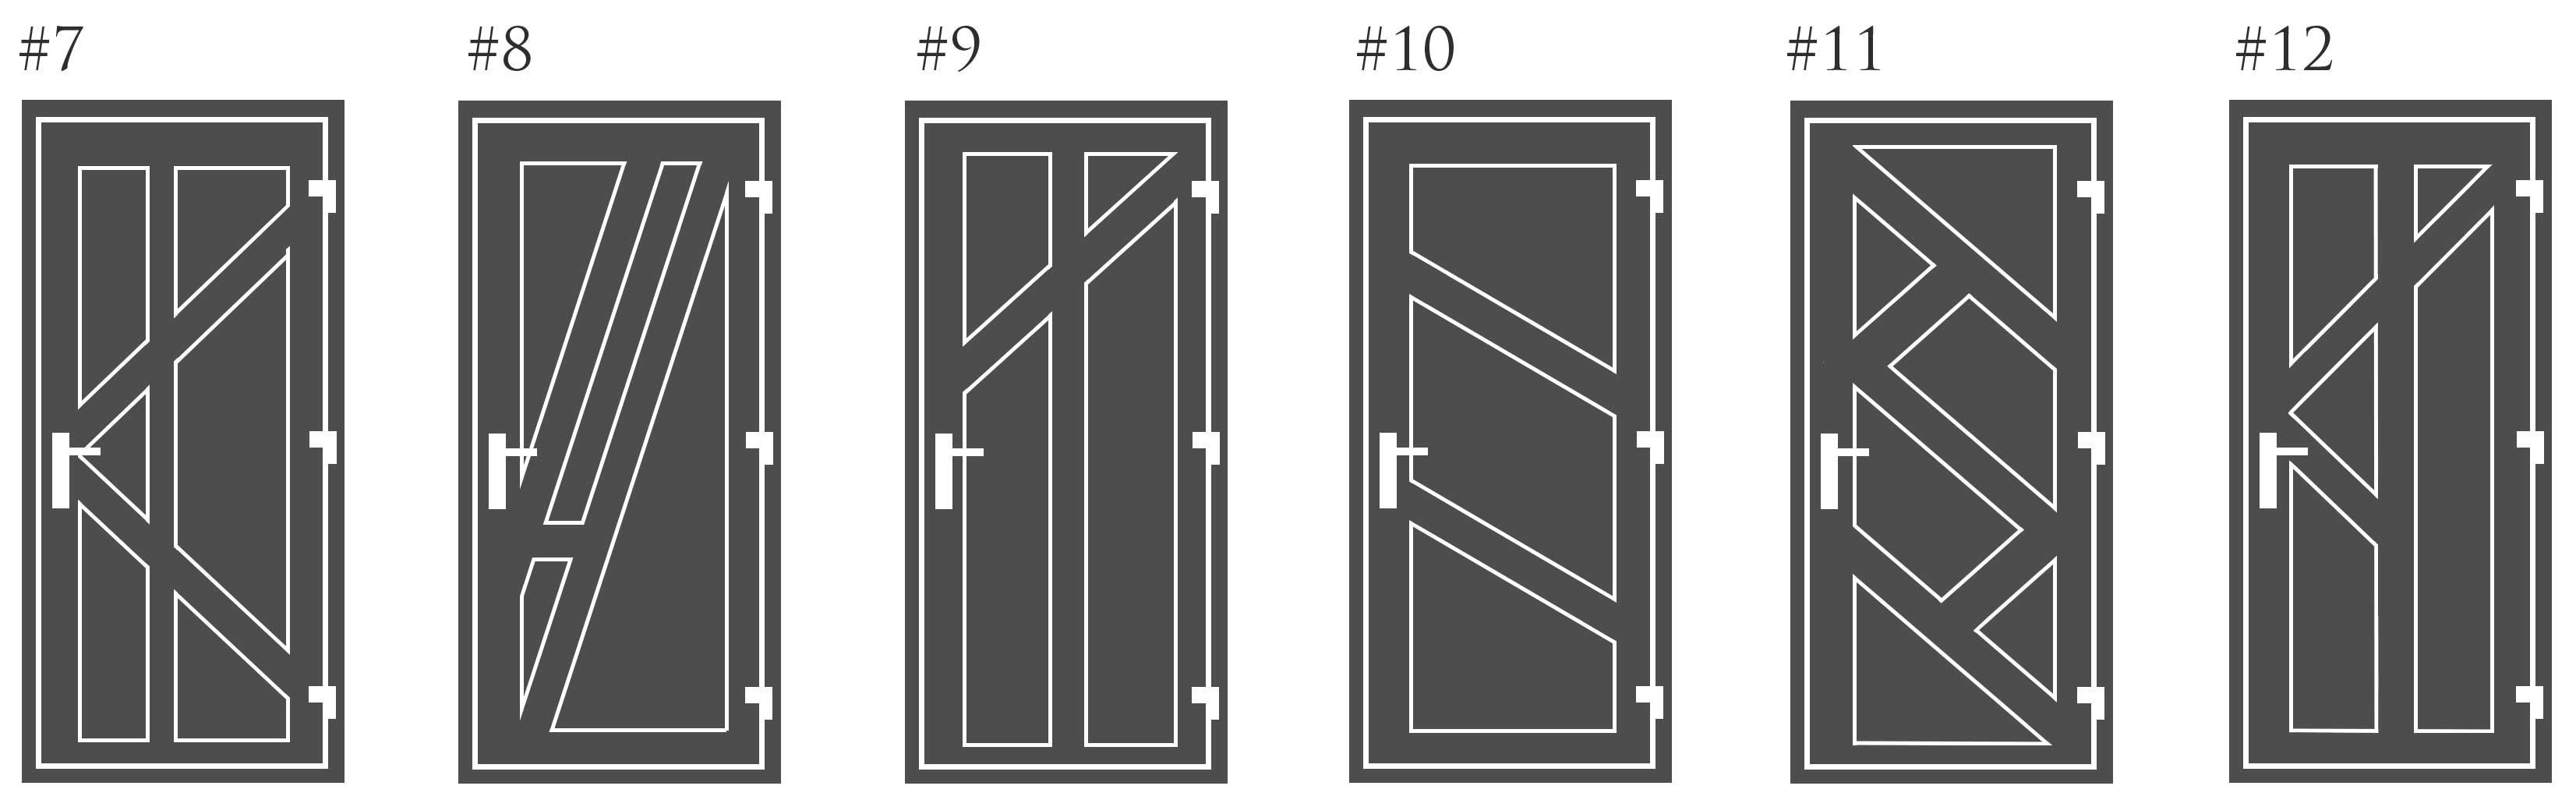 Balcony entry doors intus windows built to be energy for Steel window design 2016